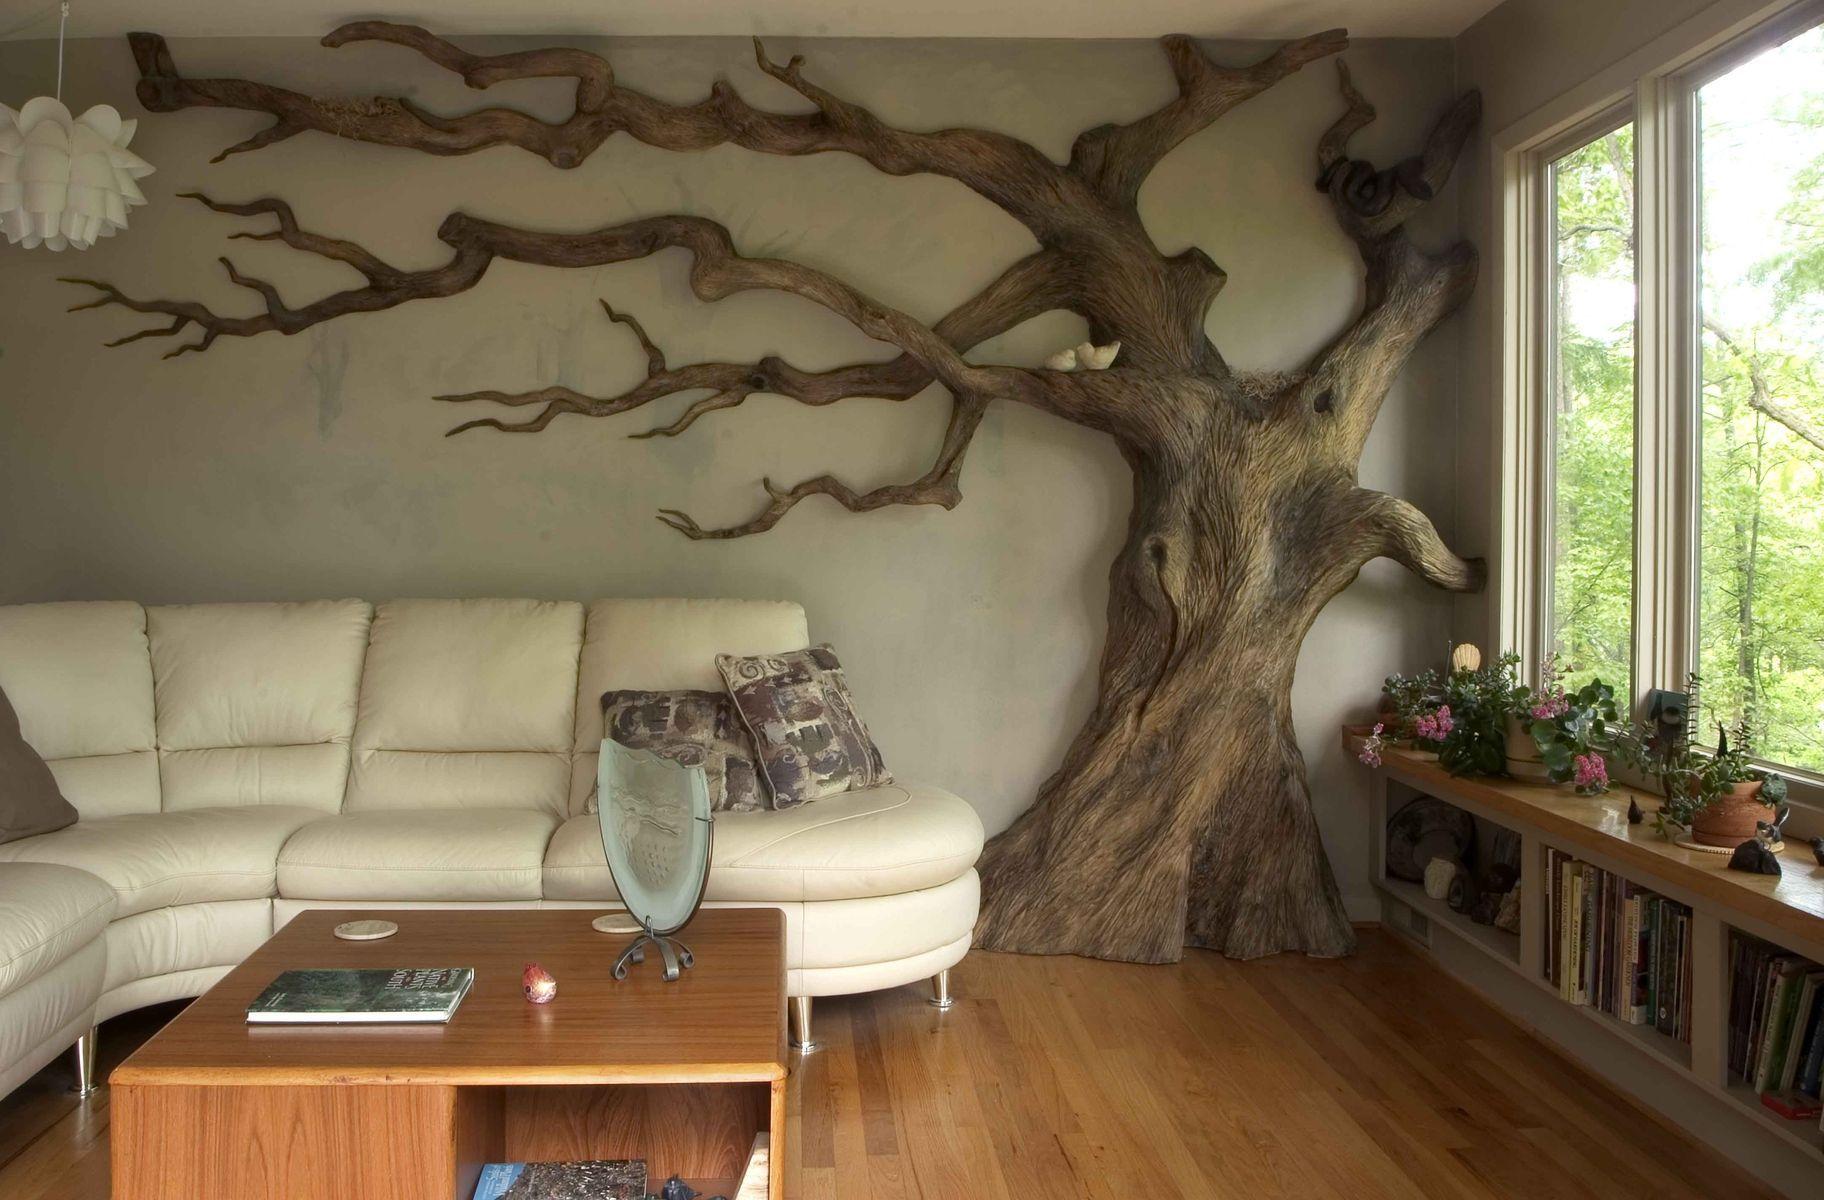 Puu toanurgas.